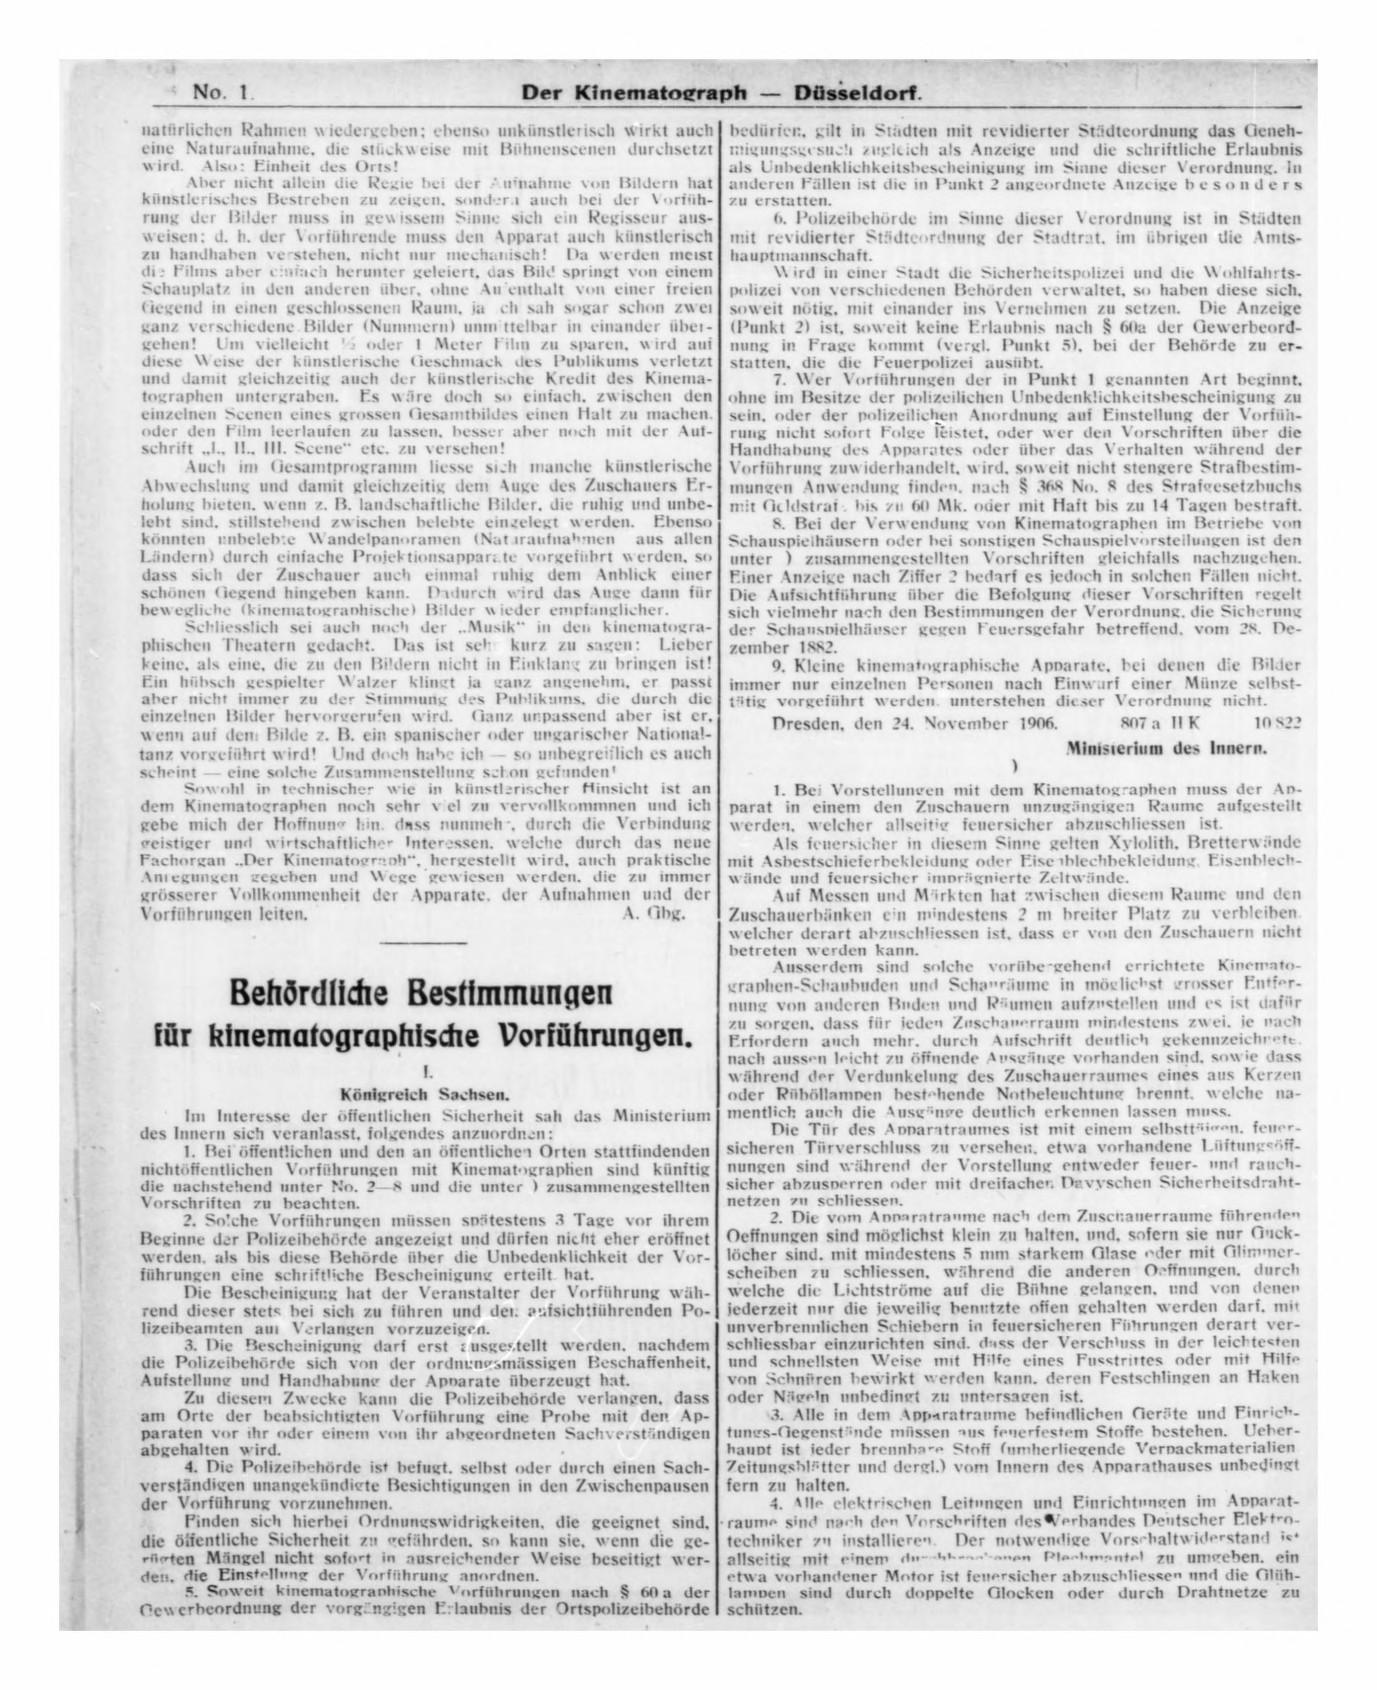 Kinematograph01-1907-01_jp2.zip&file=kinematograph01-1907-01_jp2%2fkinematograph01-1907-01_0003